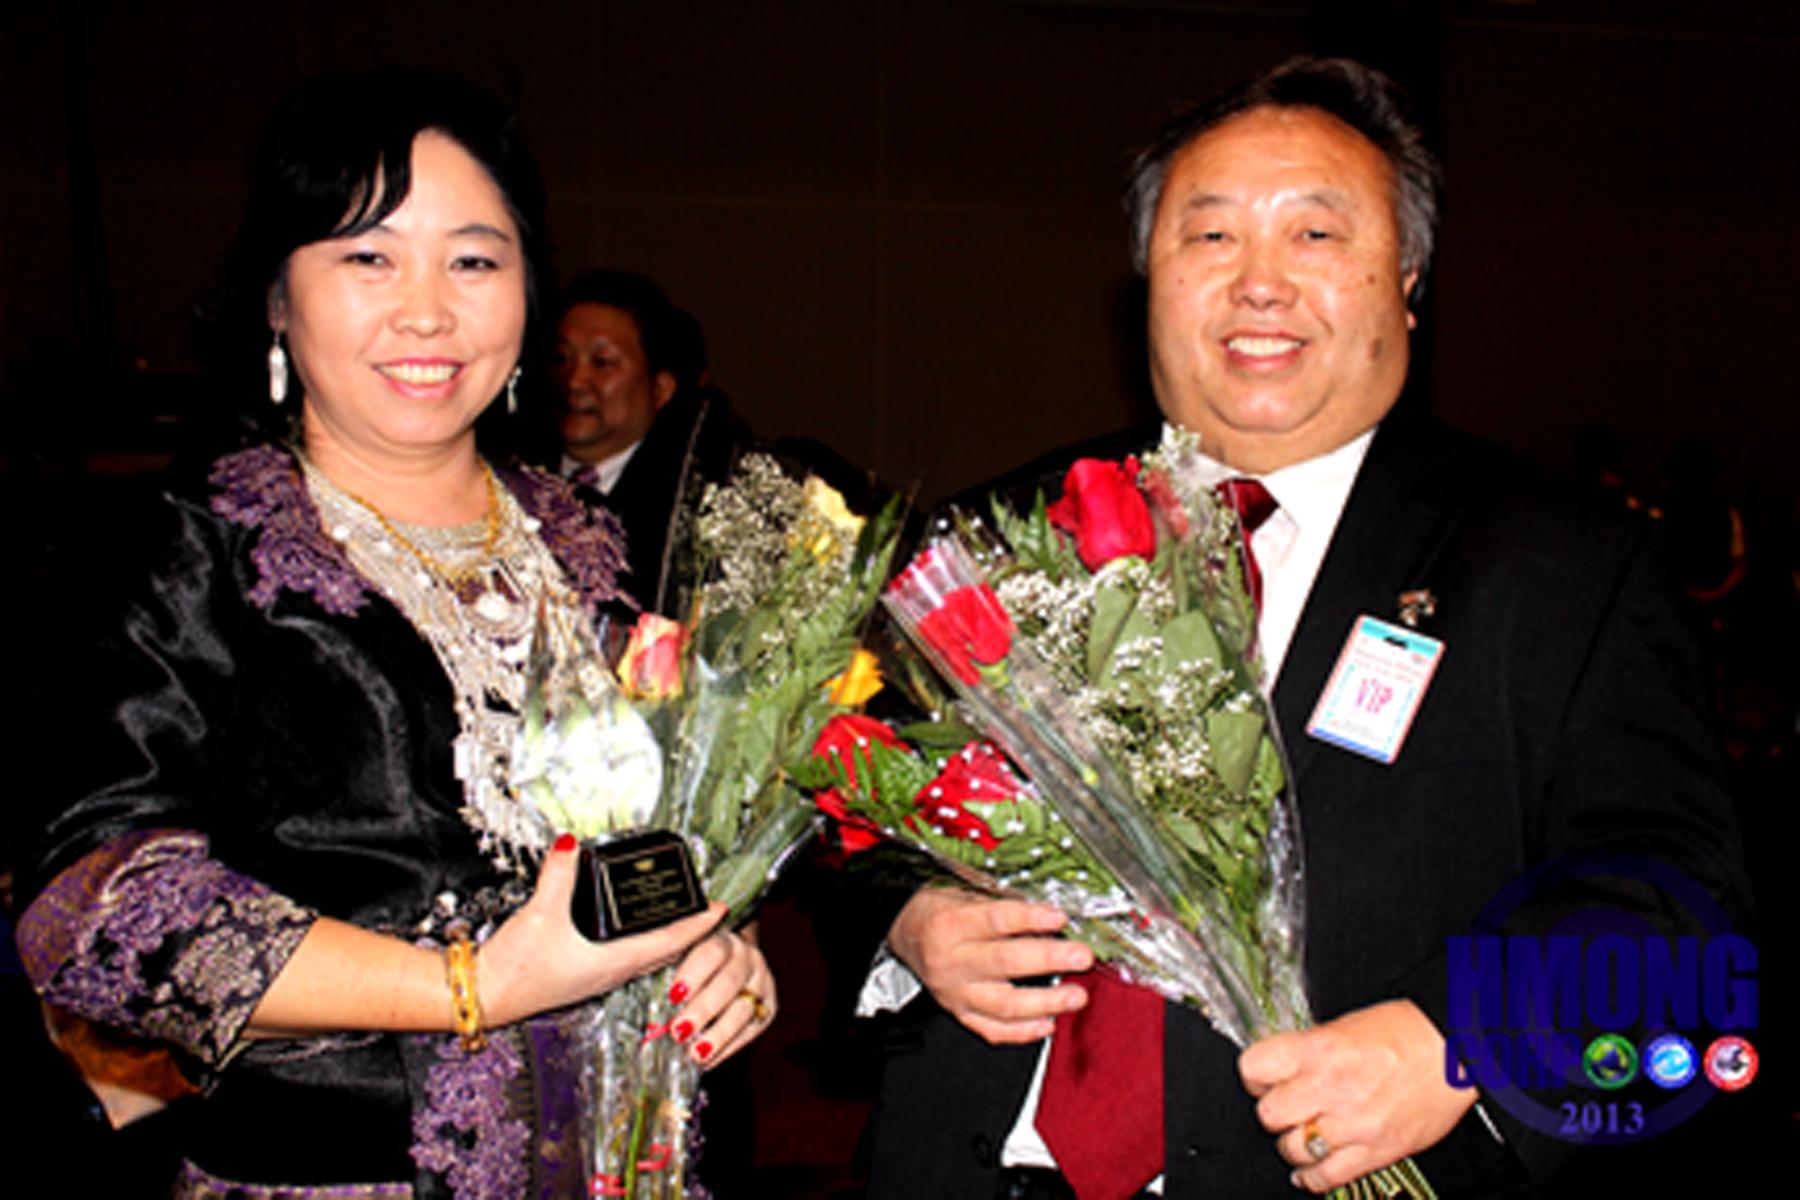 Mai Ying Her and Kou Doua Chialy Her